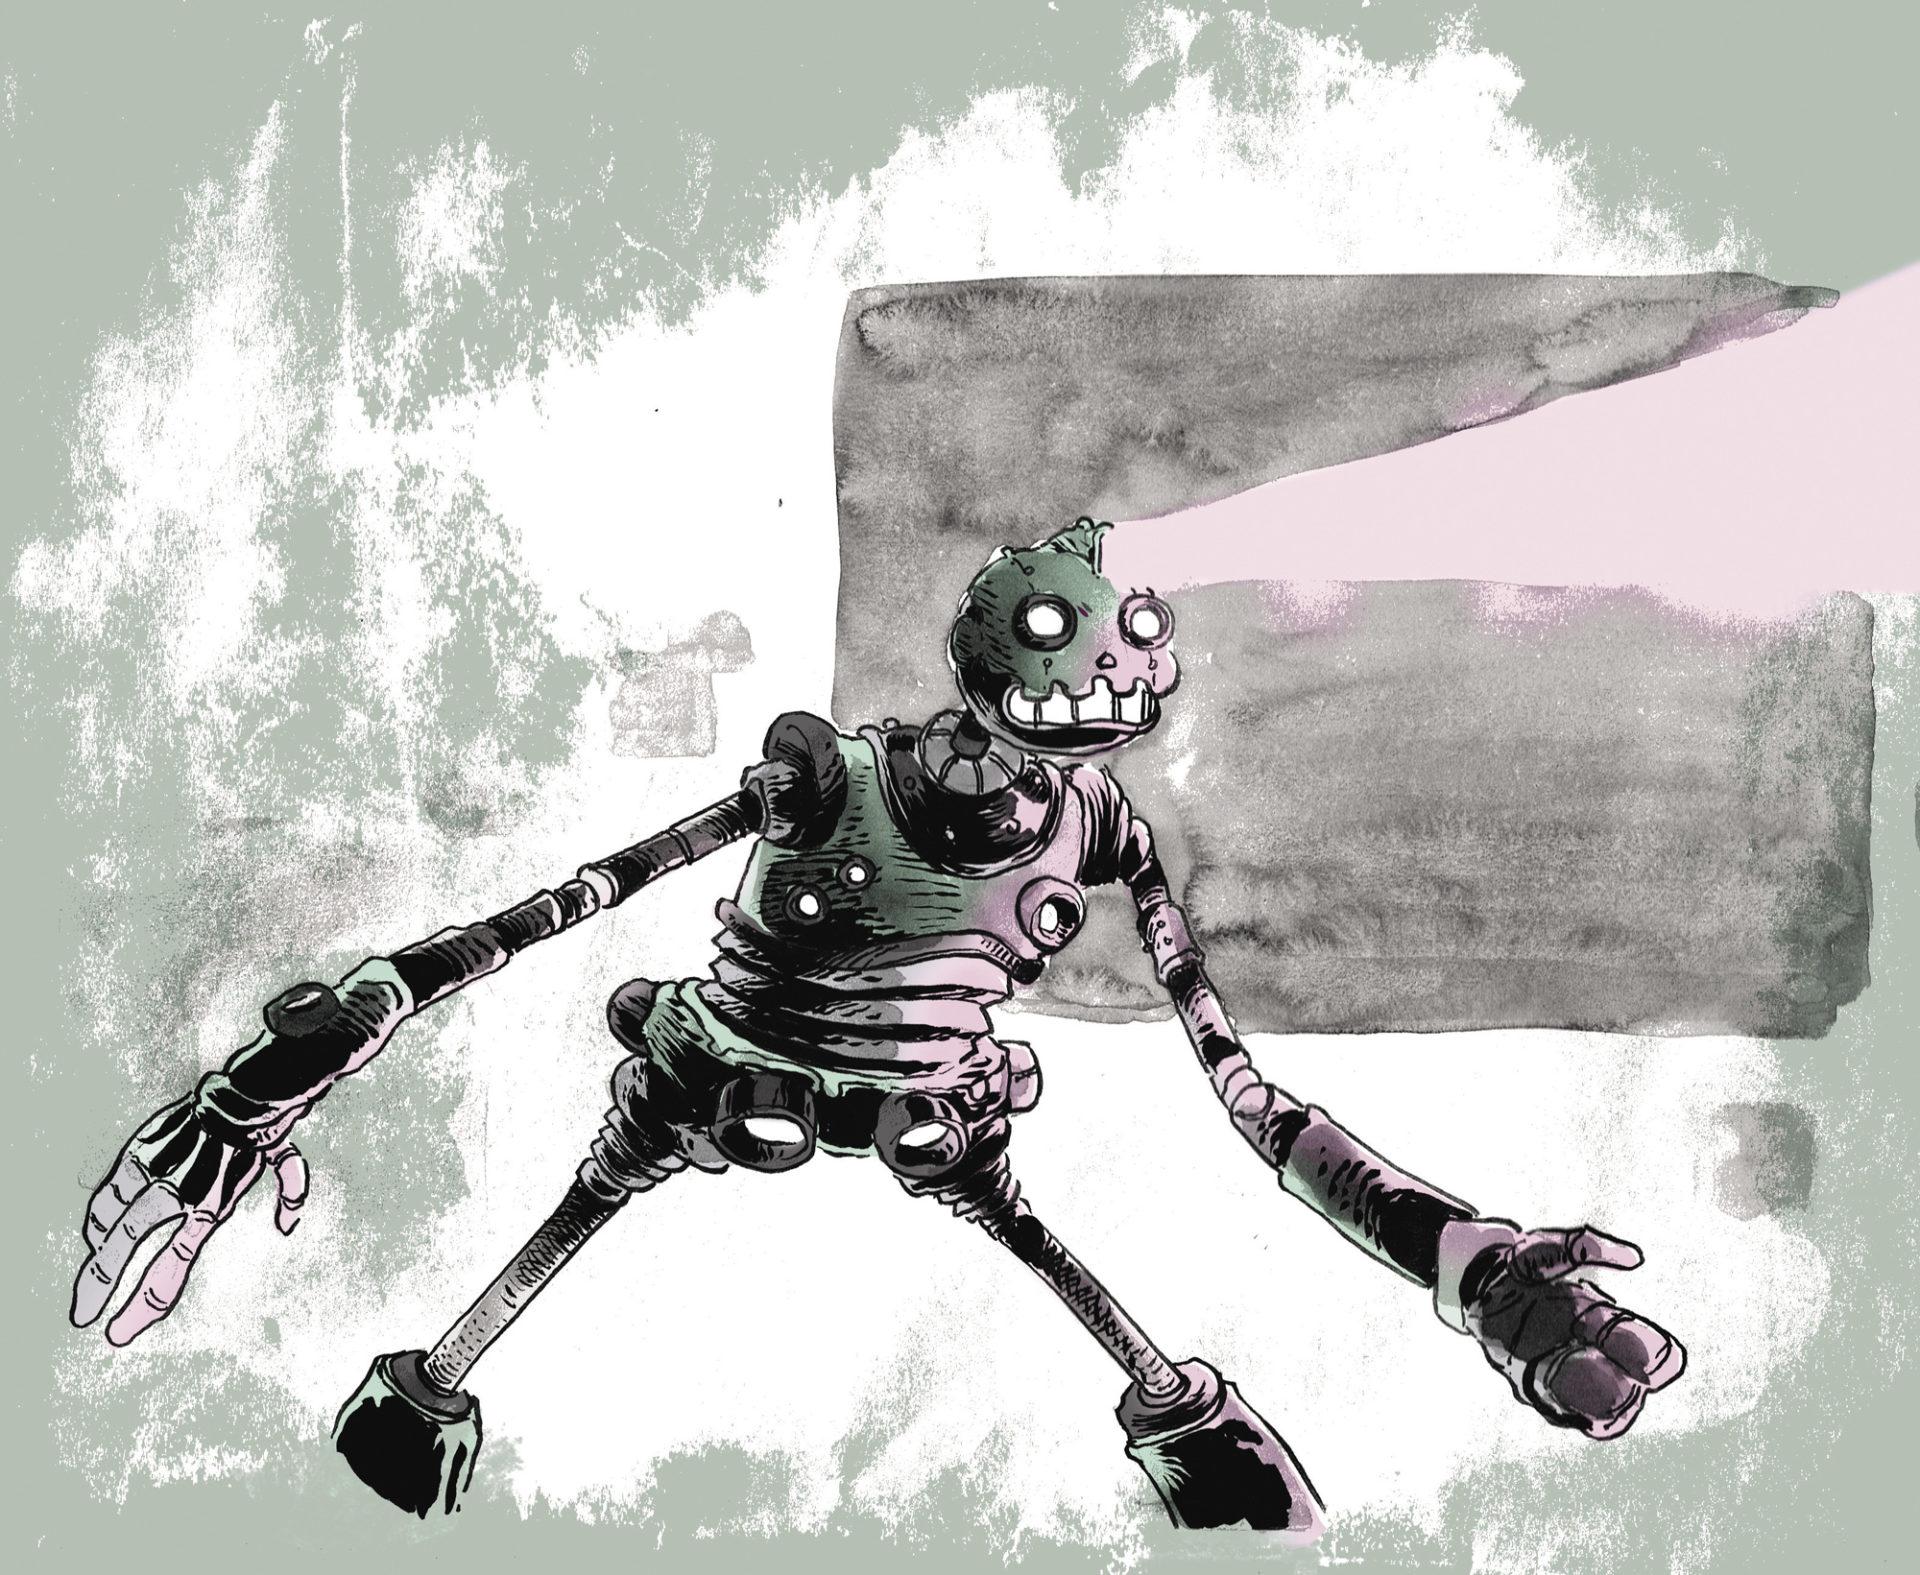 PeterGlanting_FlashlightHead_RobotSeries_Birdy091